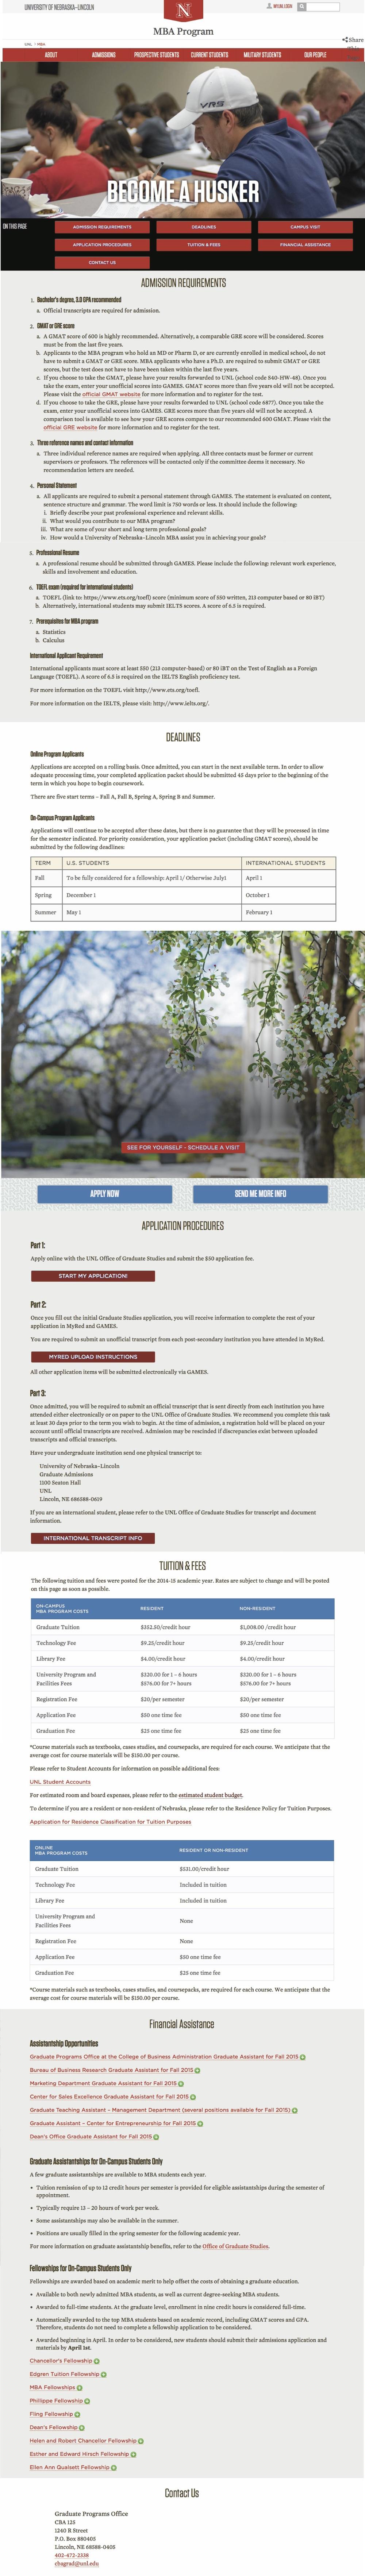 admissions.jpg